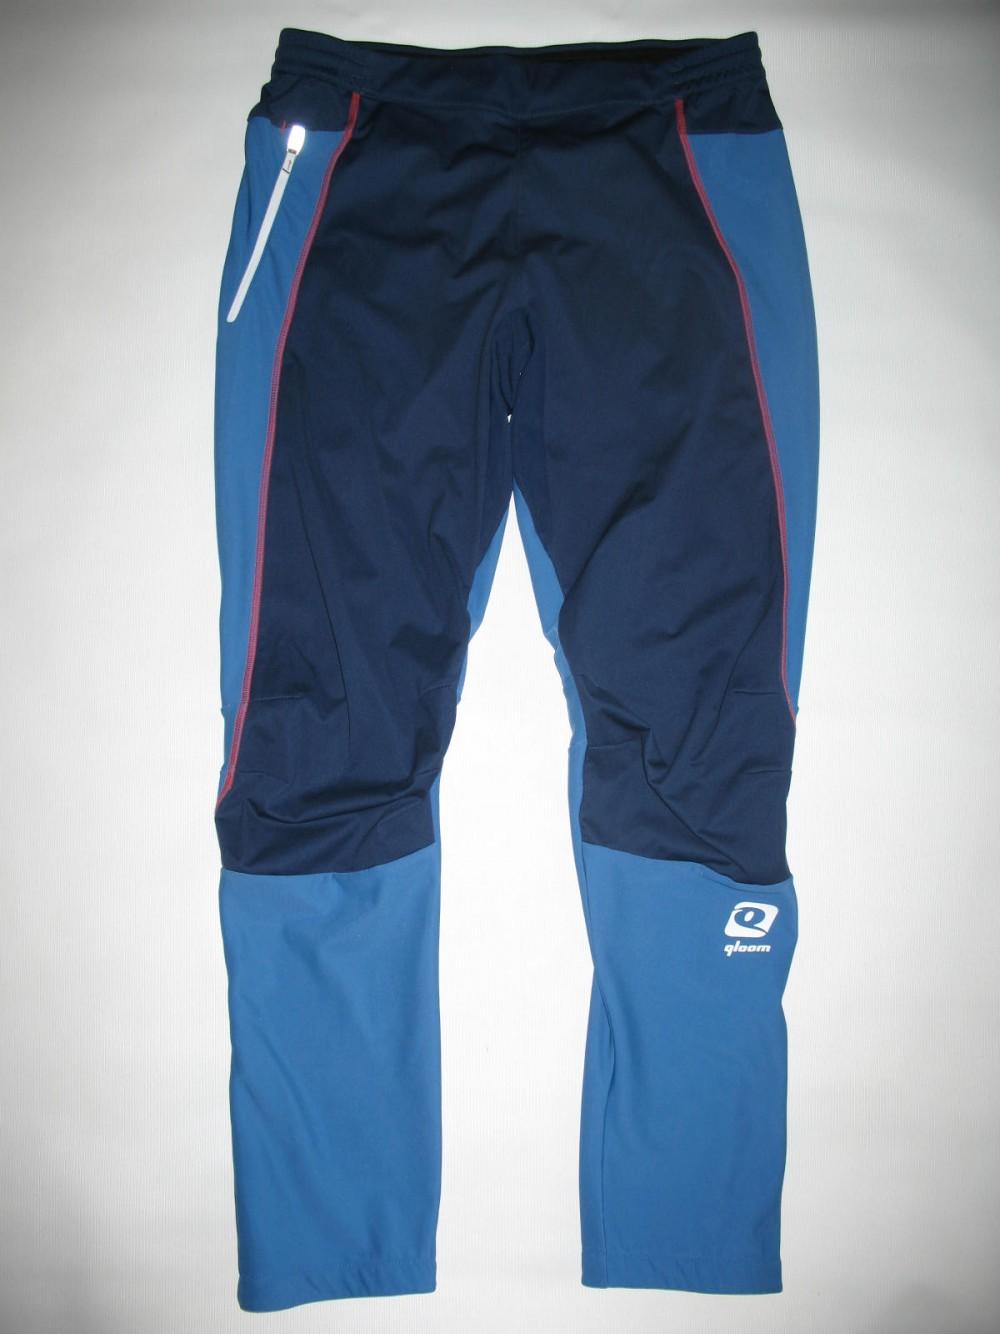 Штаны QLOOM big sky pants (размер L) - 1